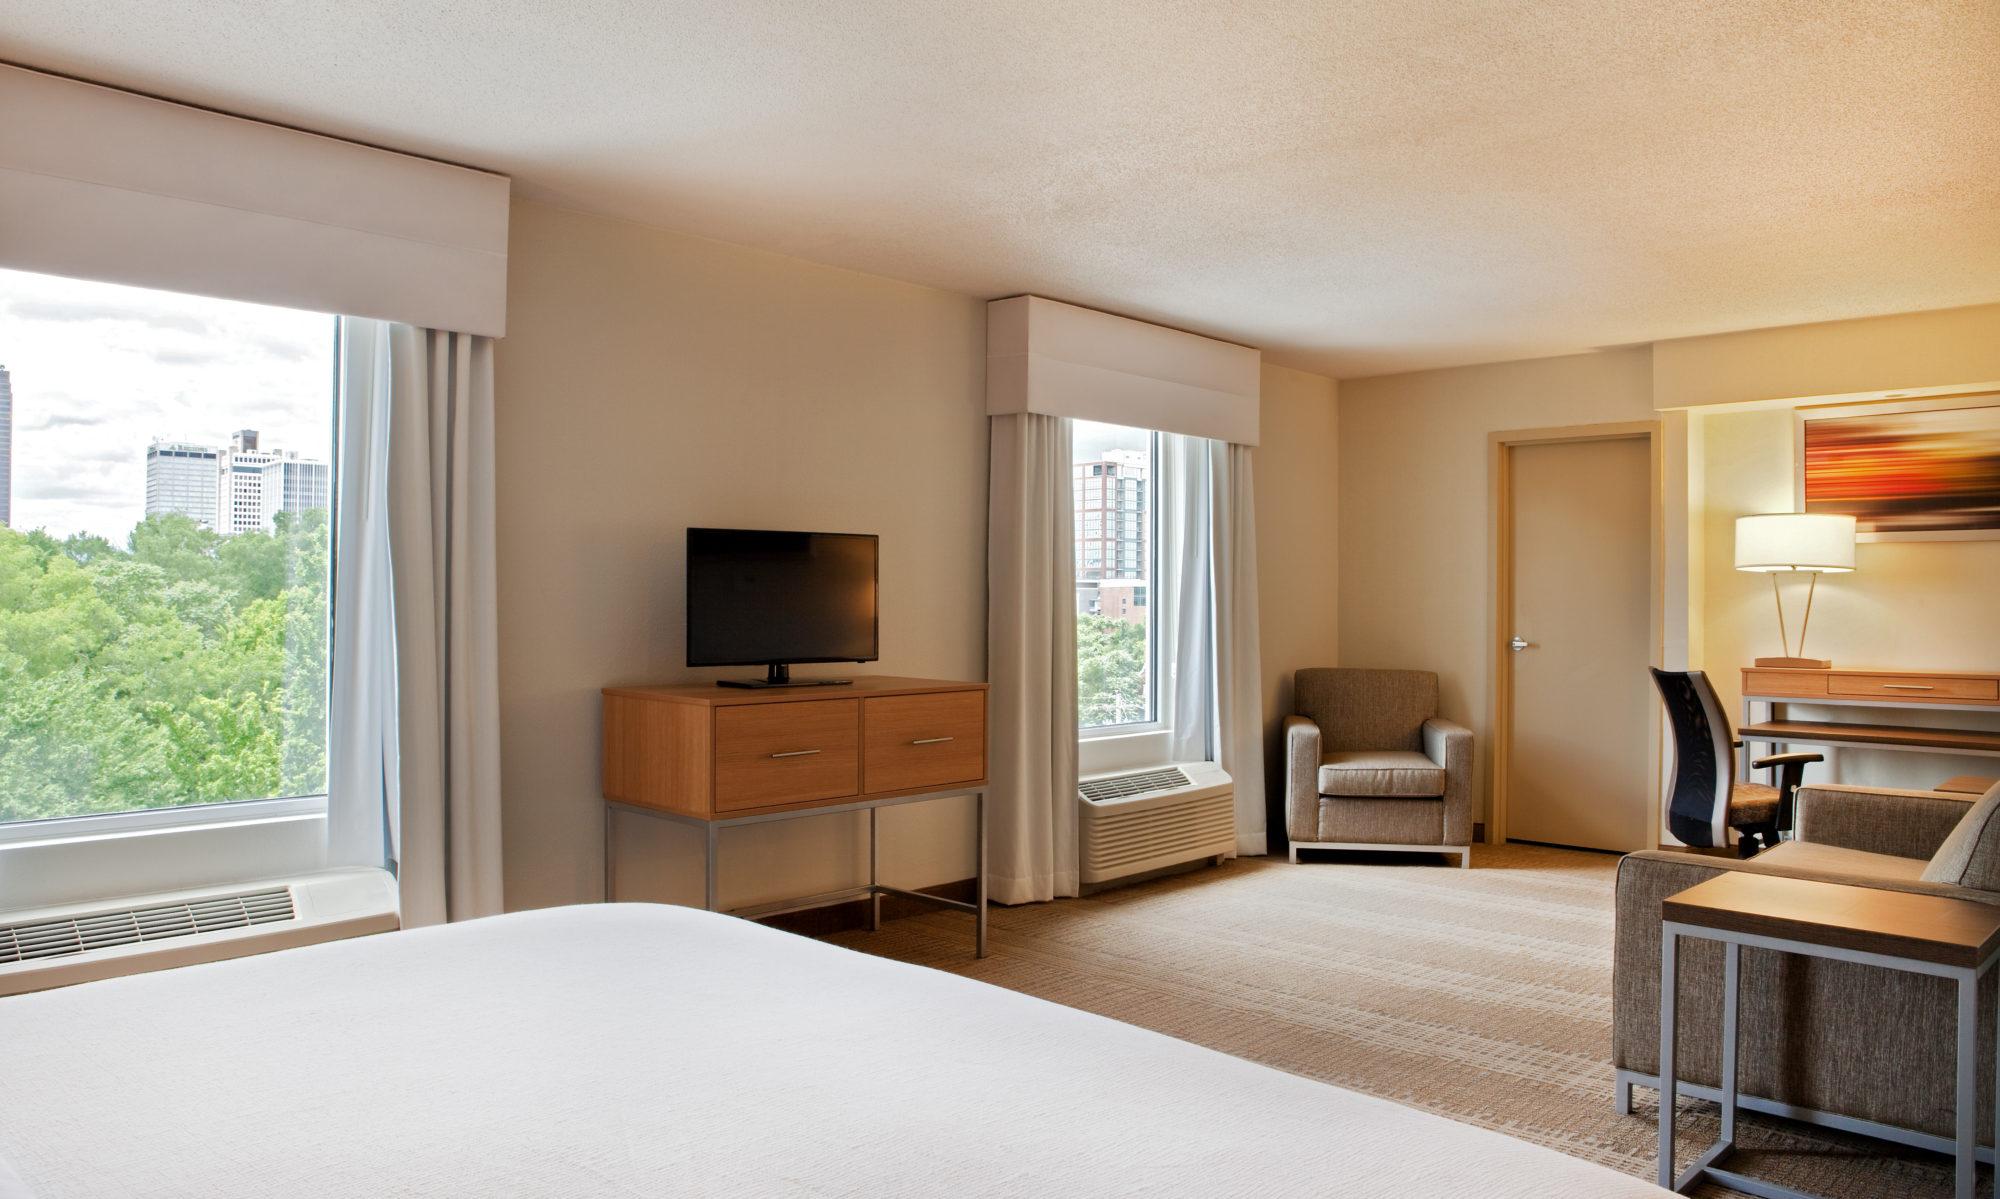 CSK hotels